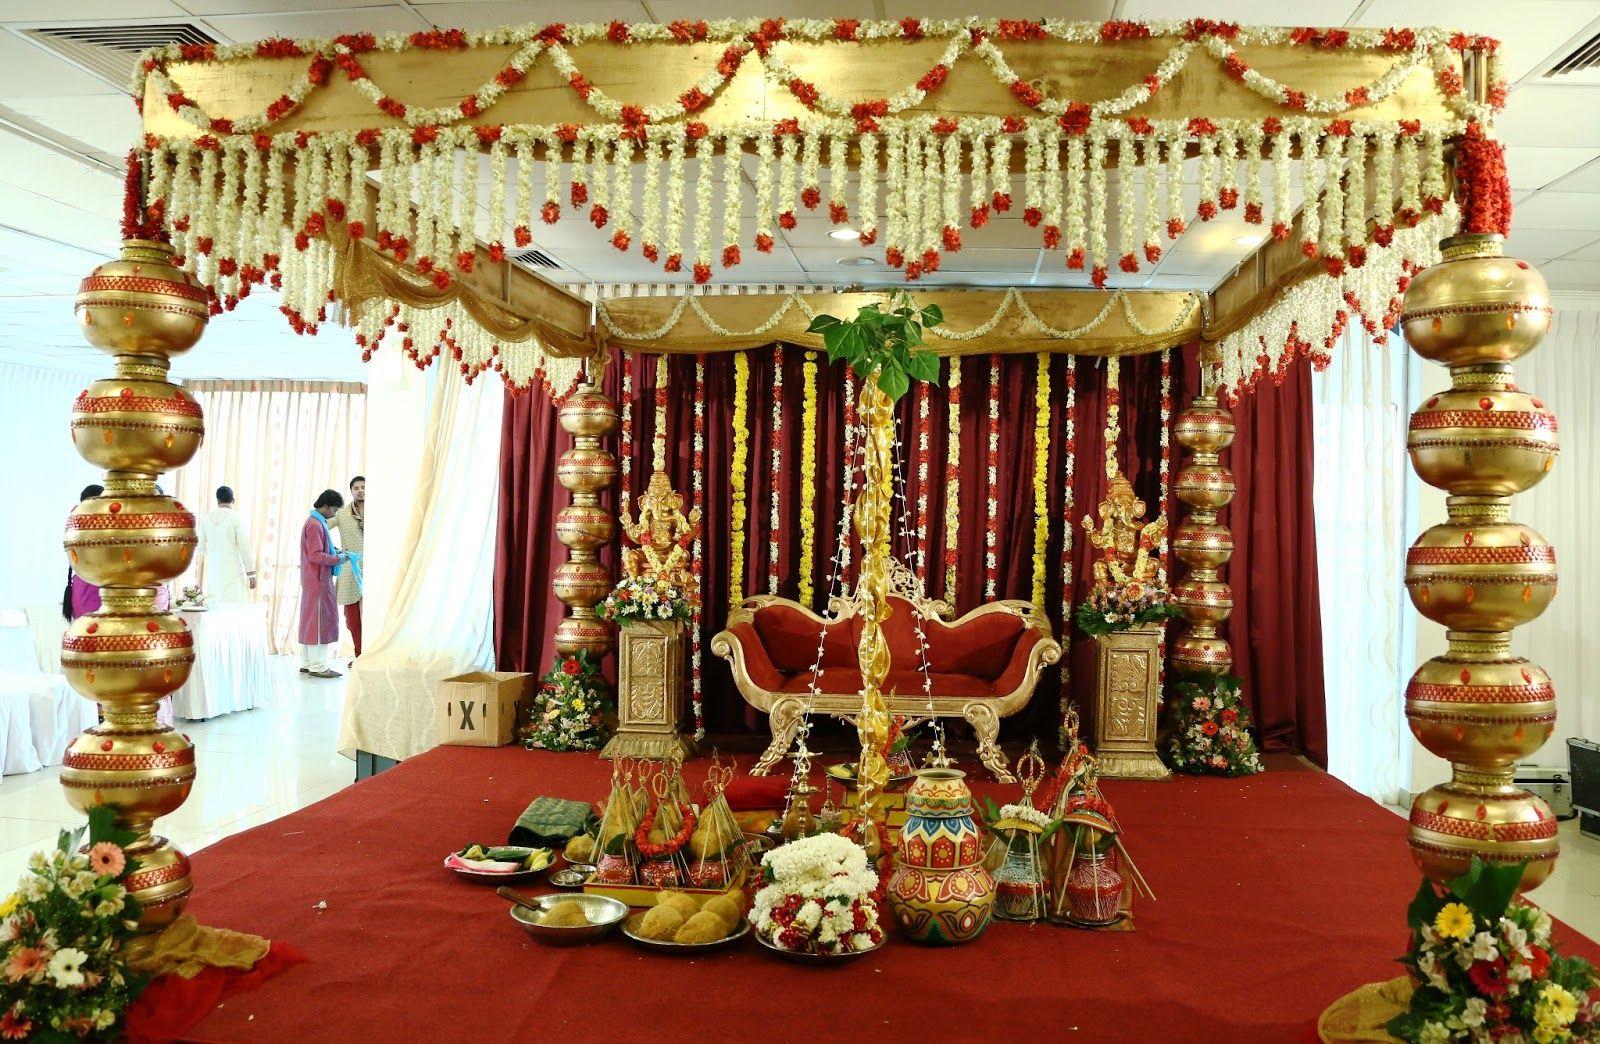 Wedding mantapa color clipart picture black and white stock kerala wedding mandap - Google Search   Big Fat Indian ... picture black and white stock